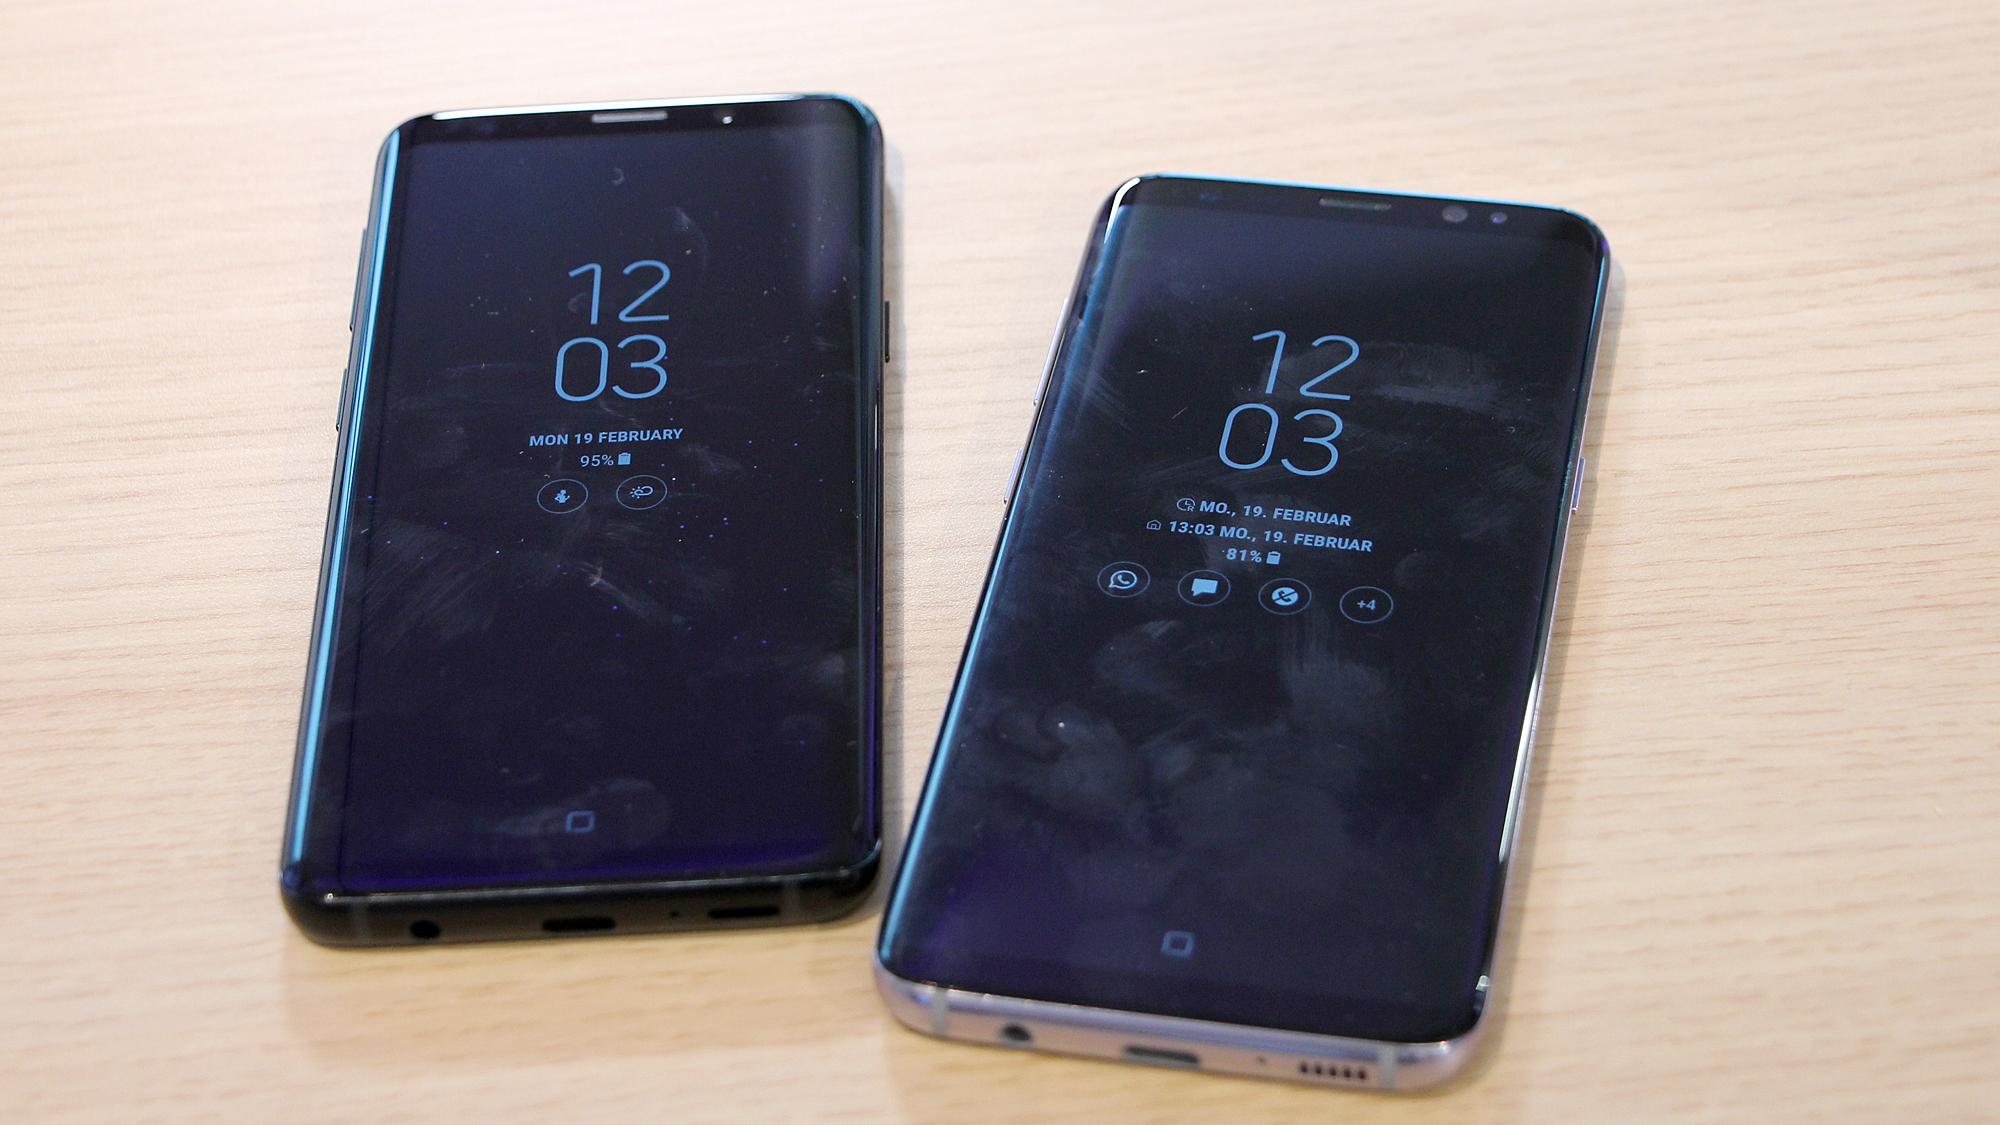 Das Samsung Galaxy S9 neben dem Samsung Galaxy S8. © Trending Topics